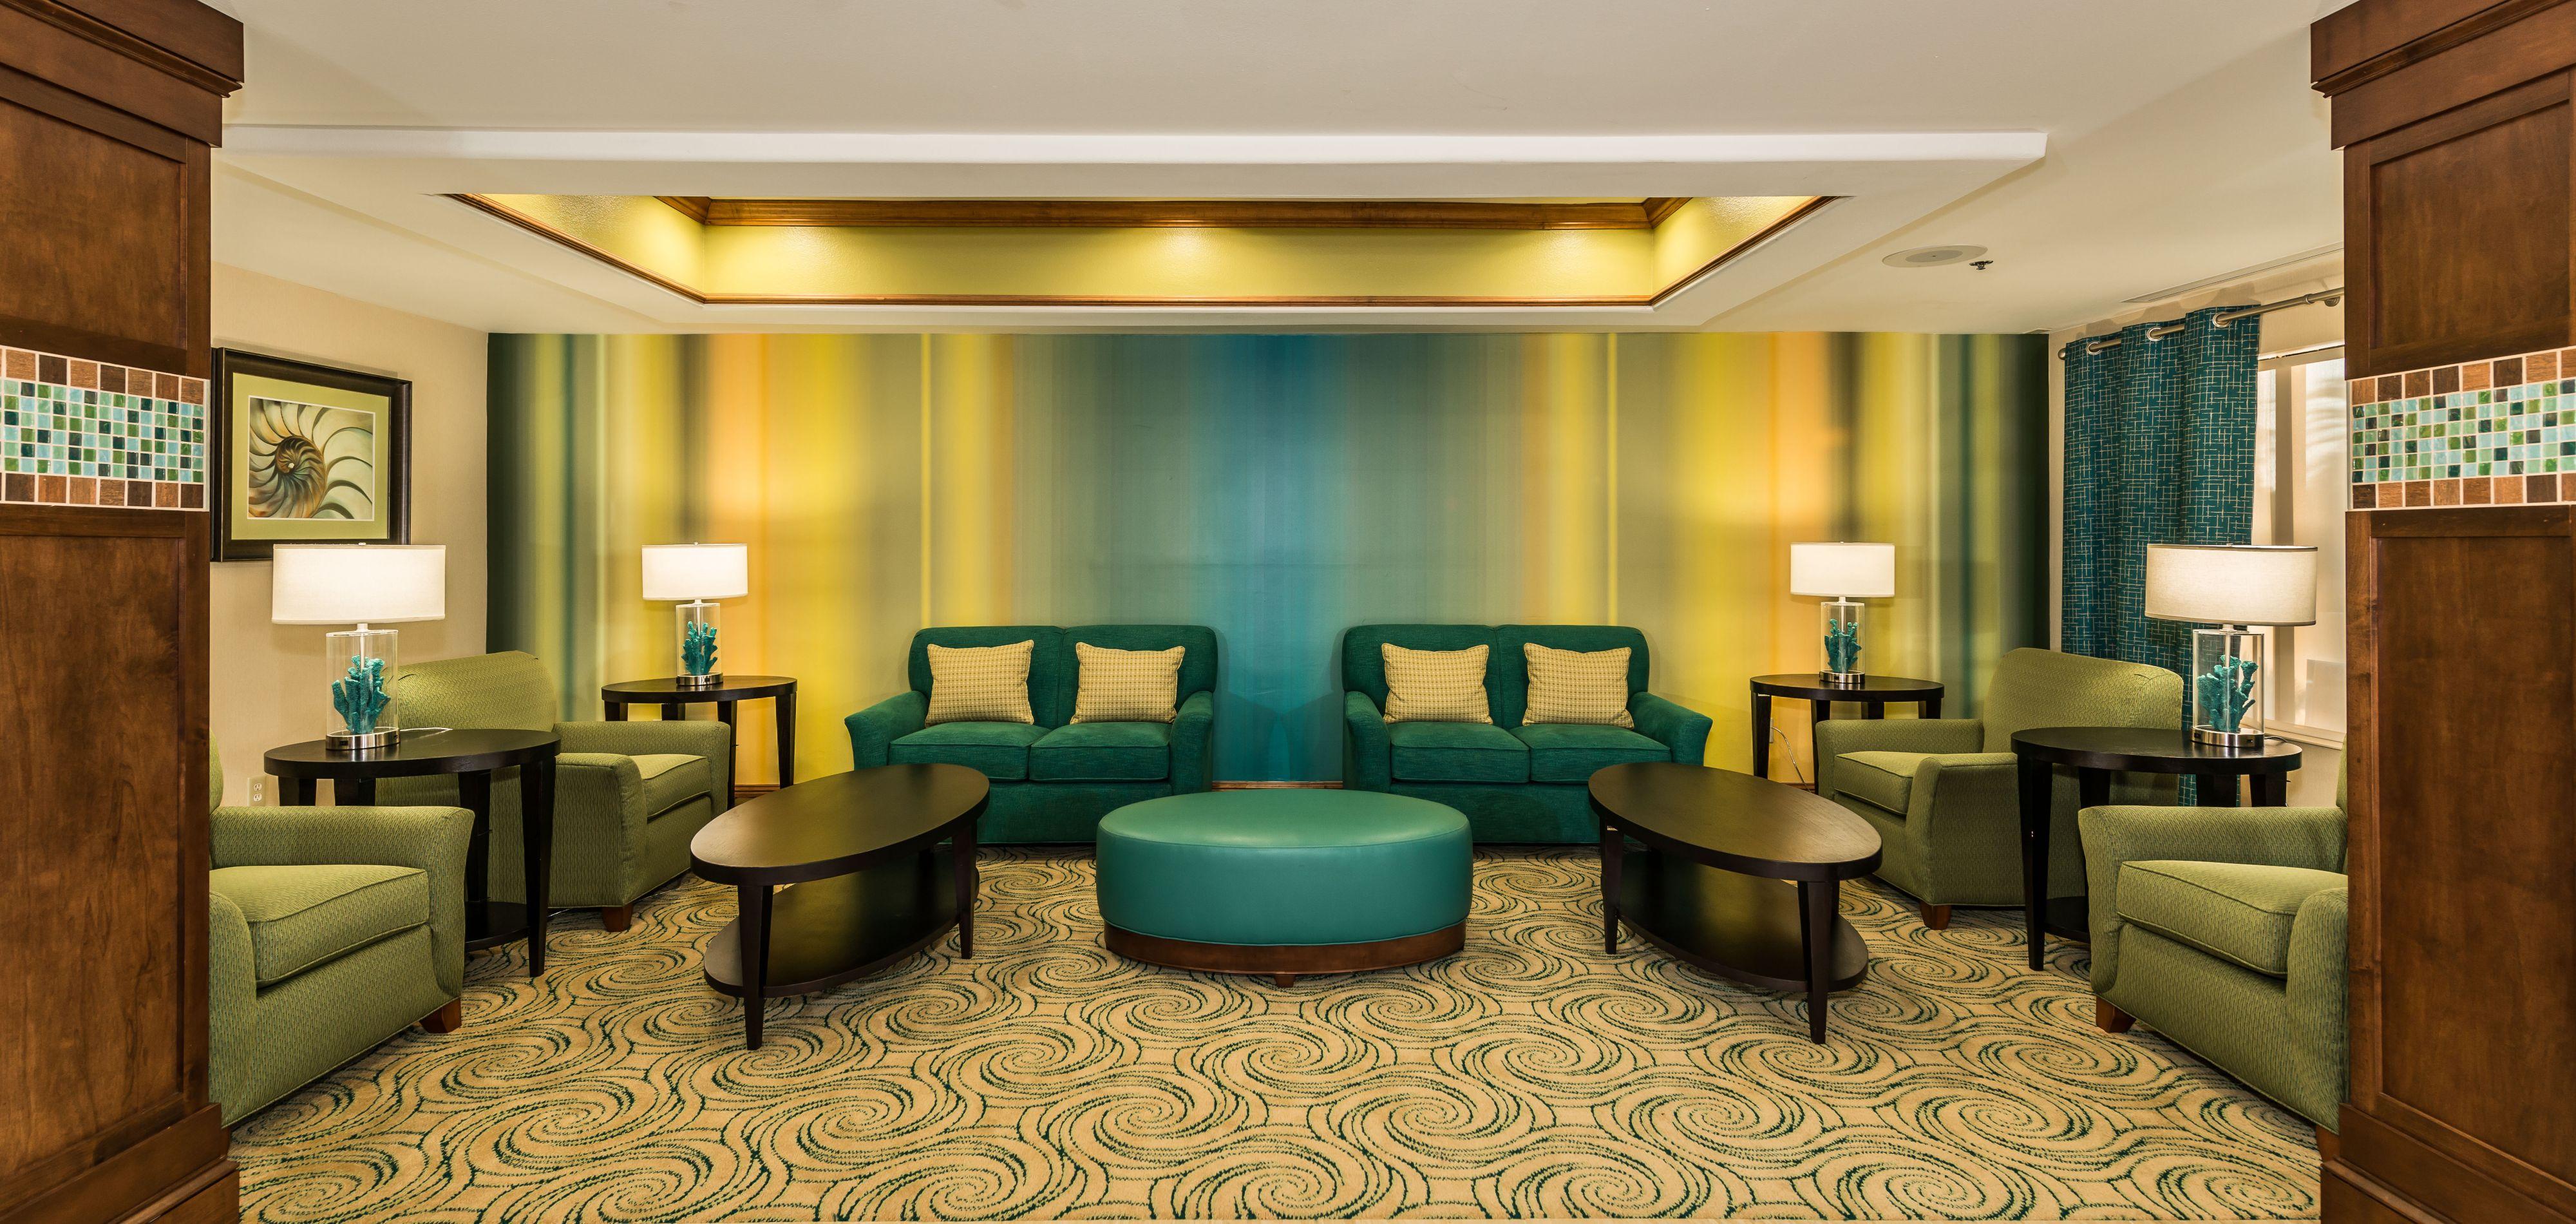 Holiday Inn Express & Suites Jacksonville - Blount Island image 5